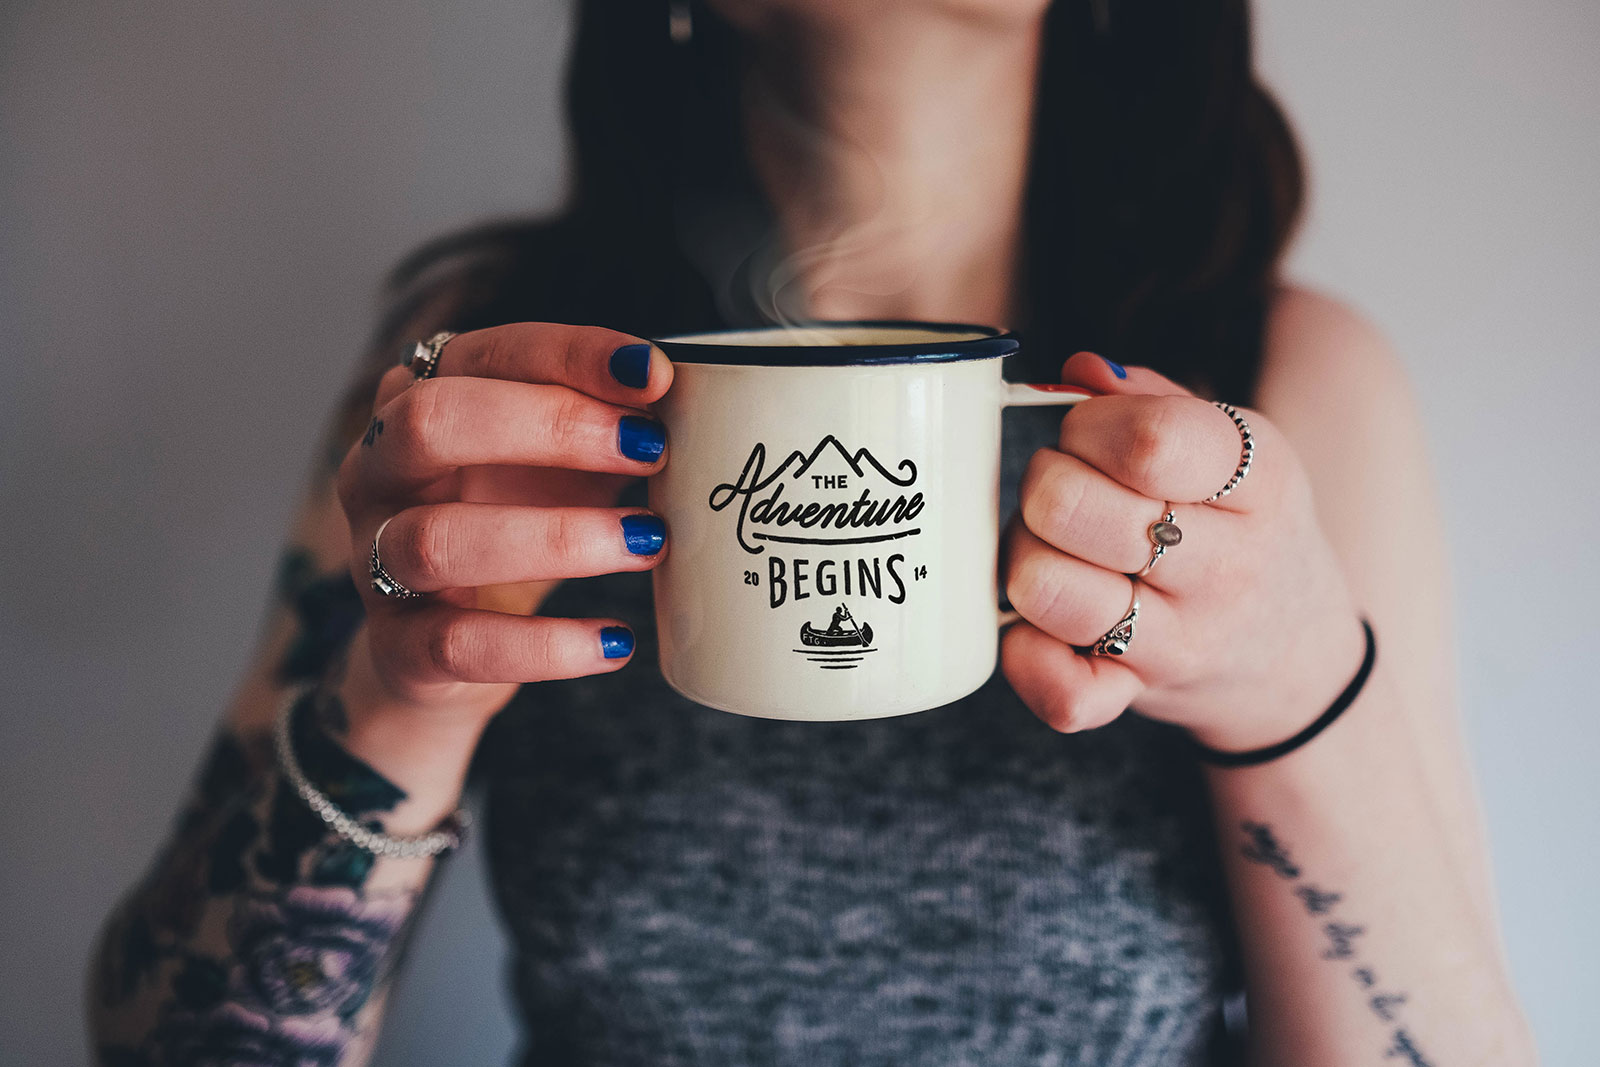 Free-Enamel-Coffee-Mug-Photo-Mockup-PSD